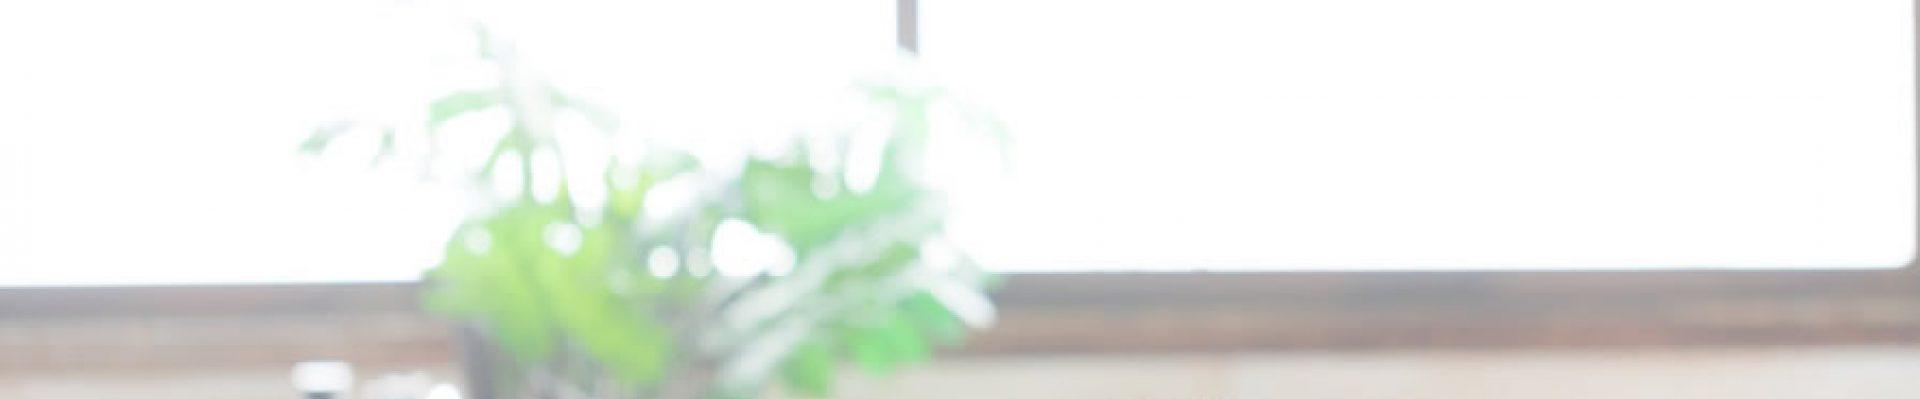 Cleam(クリーム)│女性の為のプチ稼ぎ、在宅ワークを応援するミステリーWEBショッパーが集まるサイト